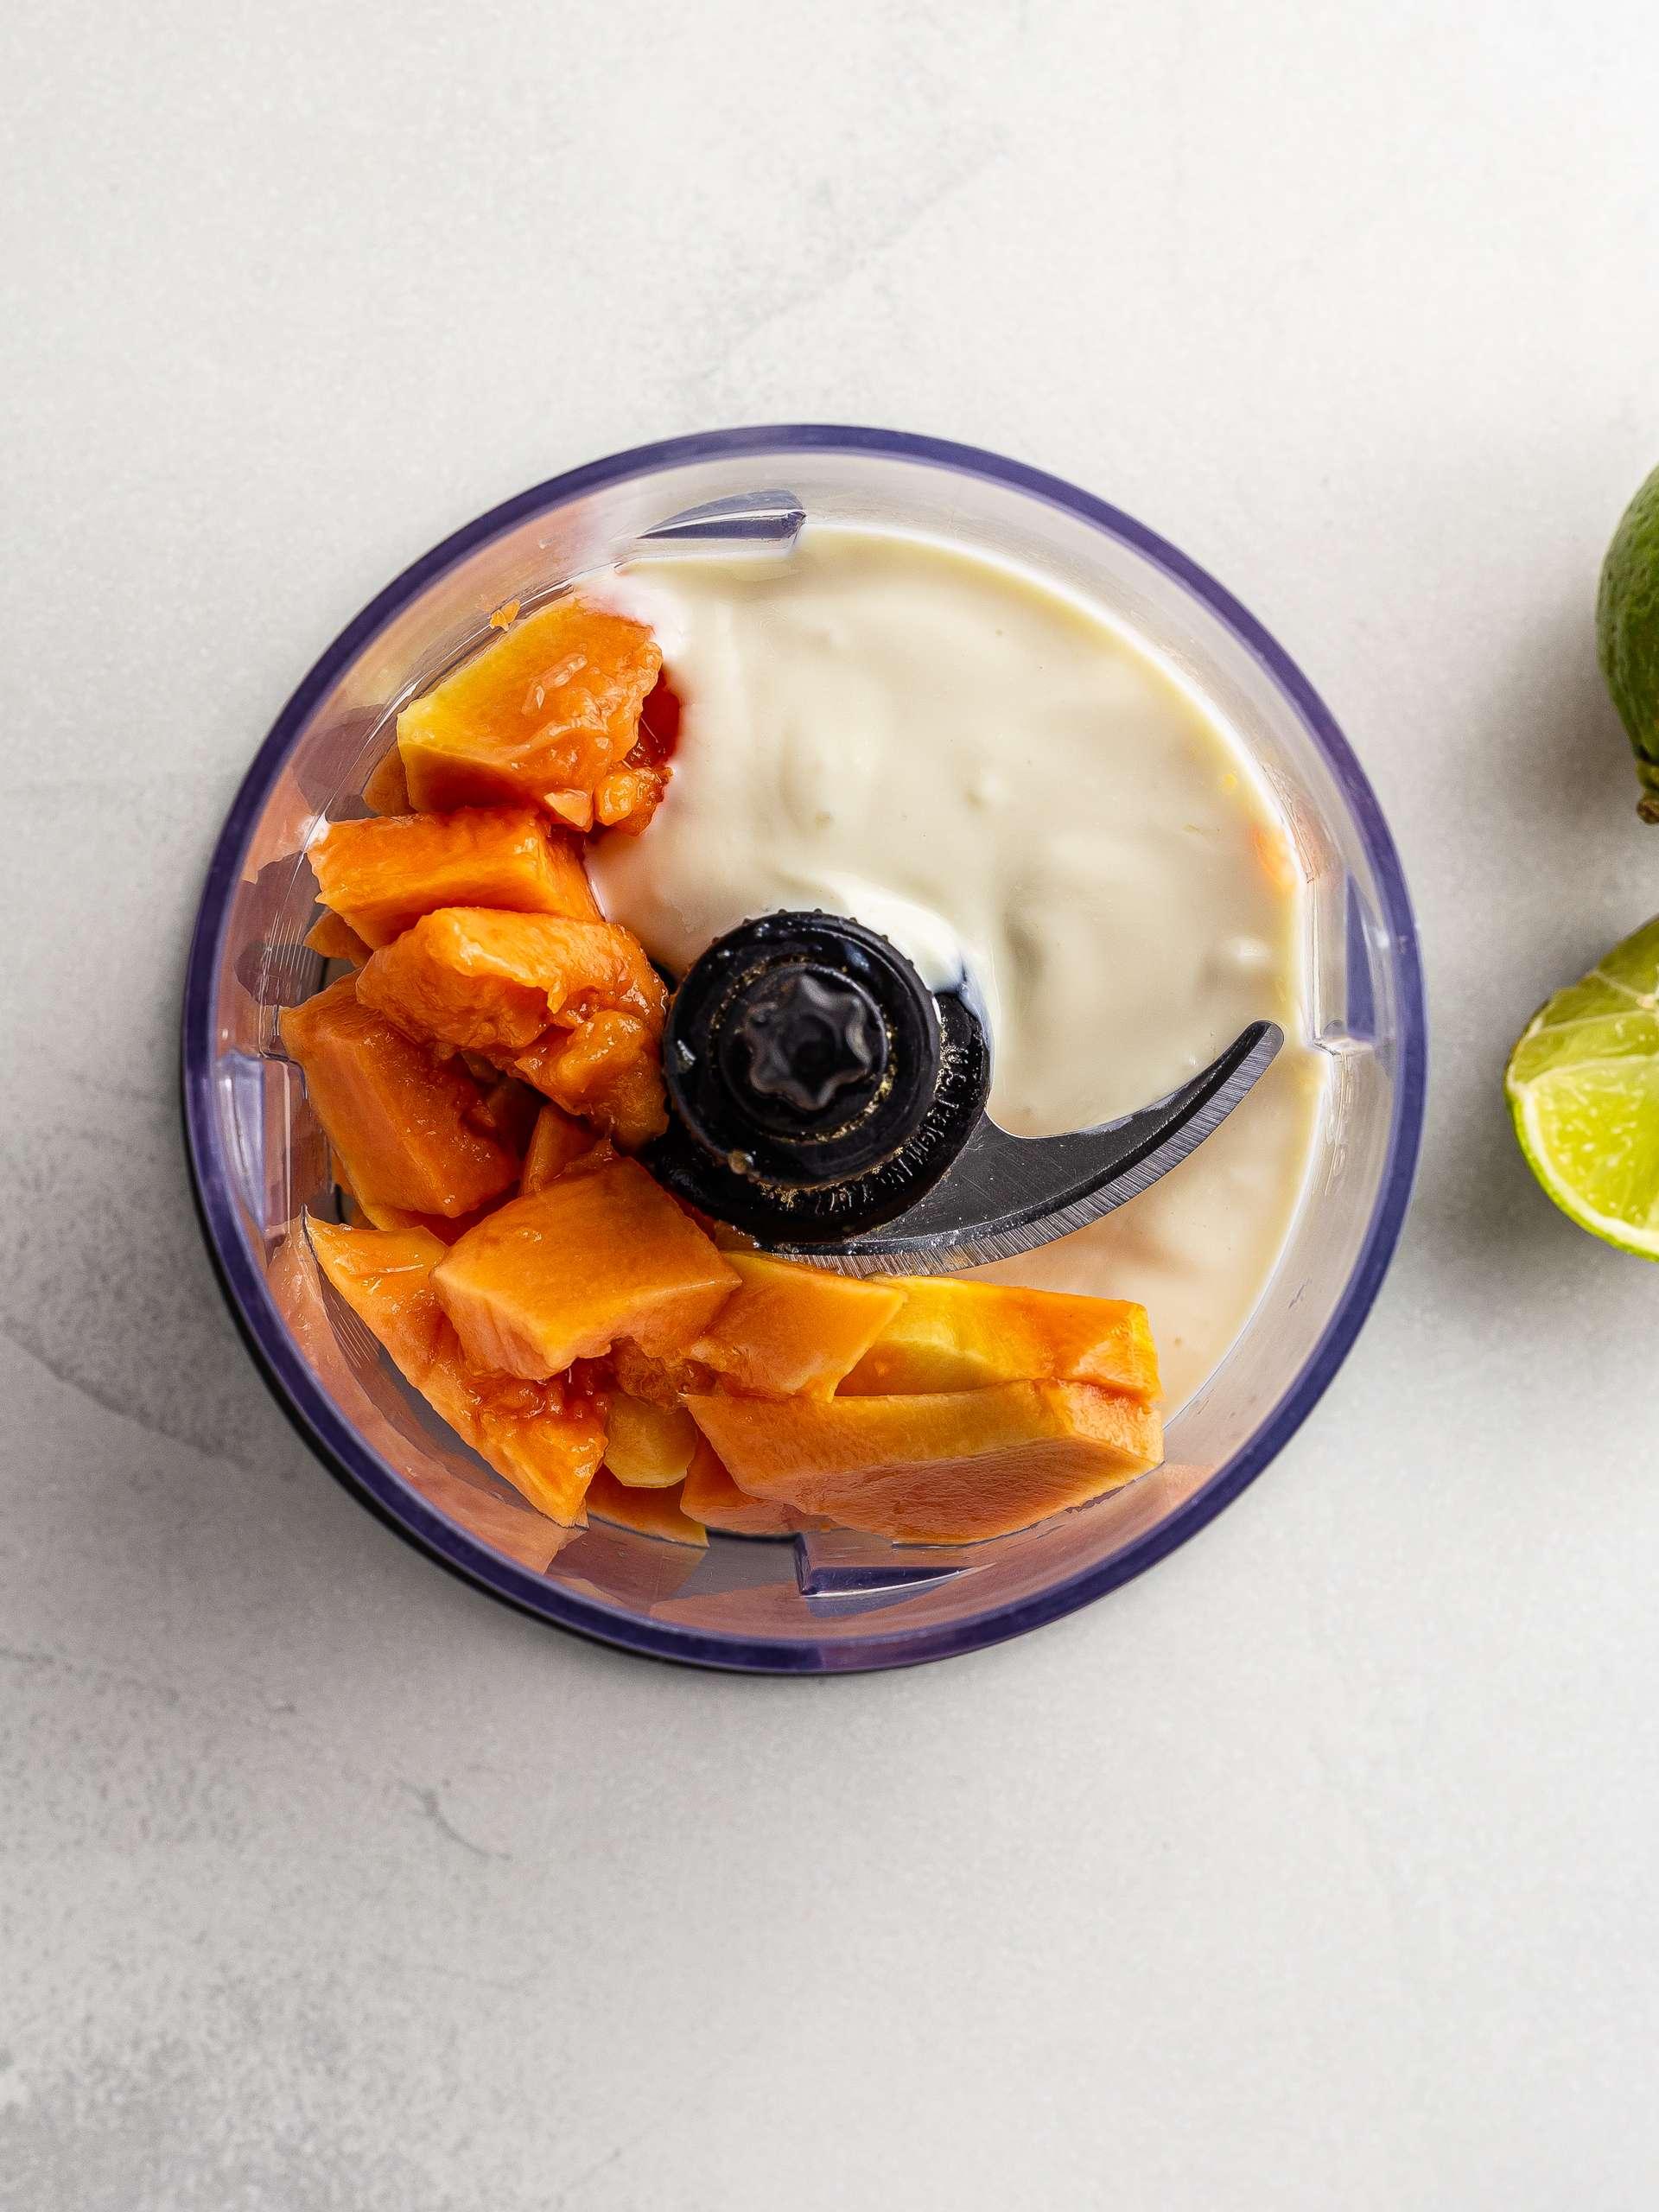 papaya yogurt and lime juice in a blender